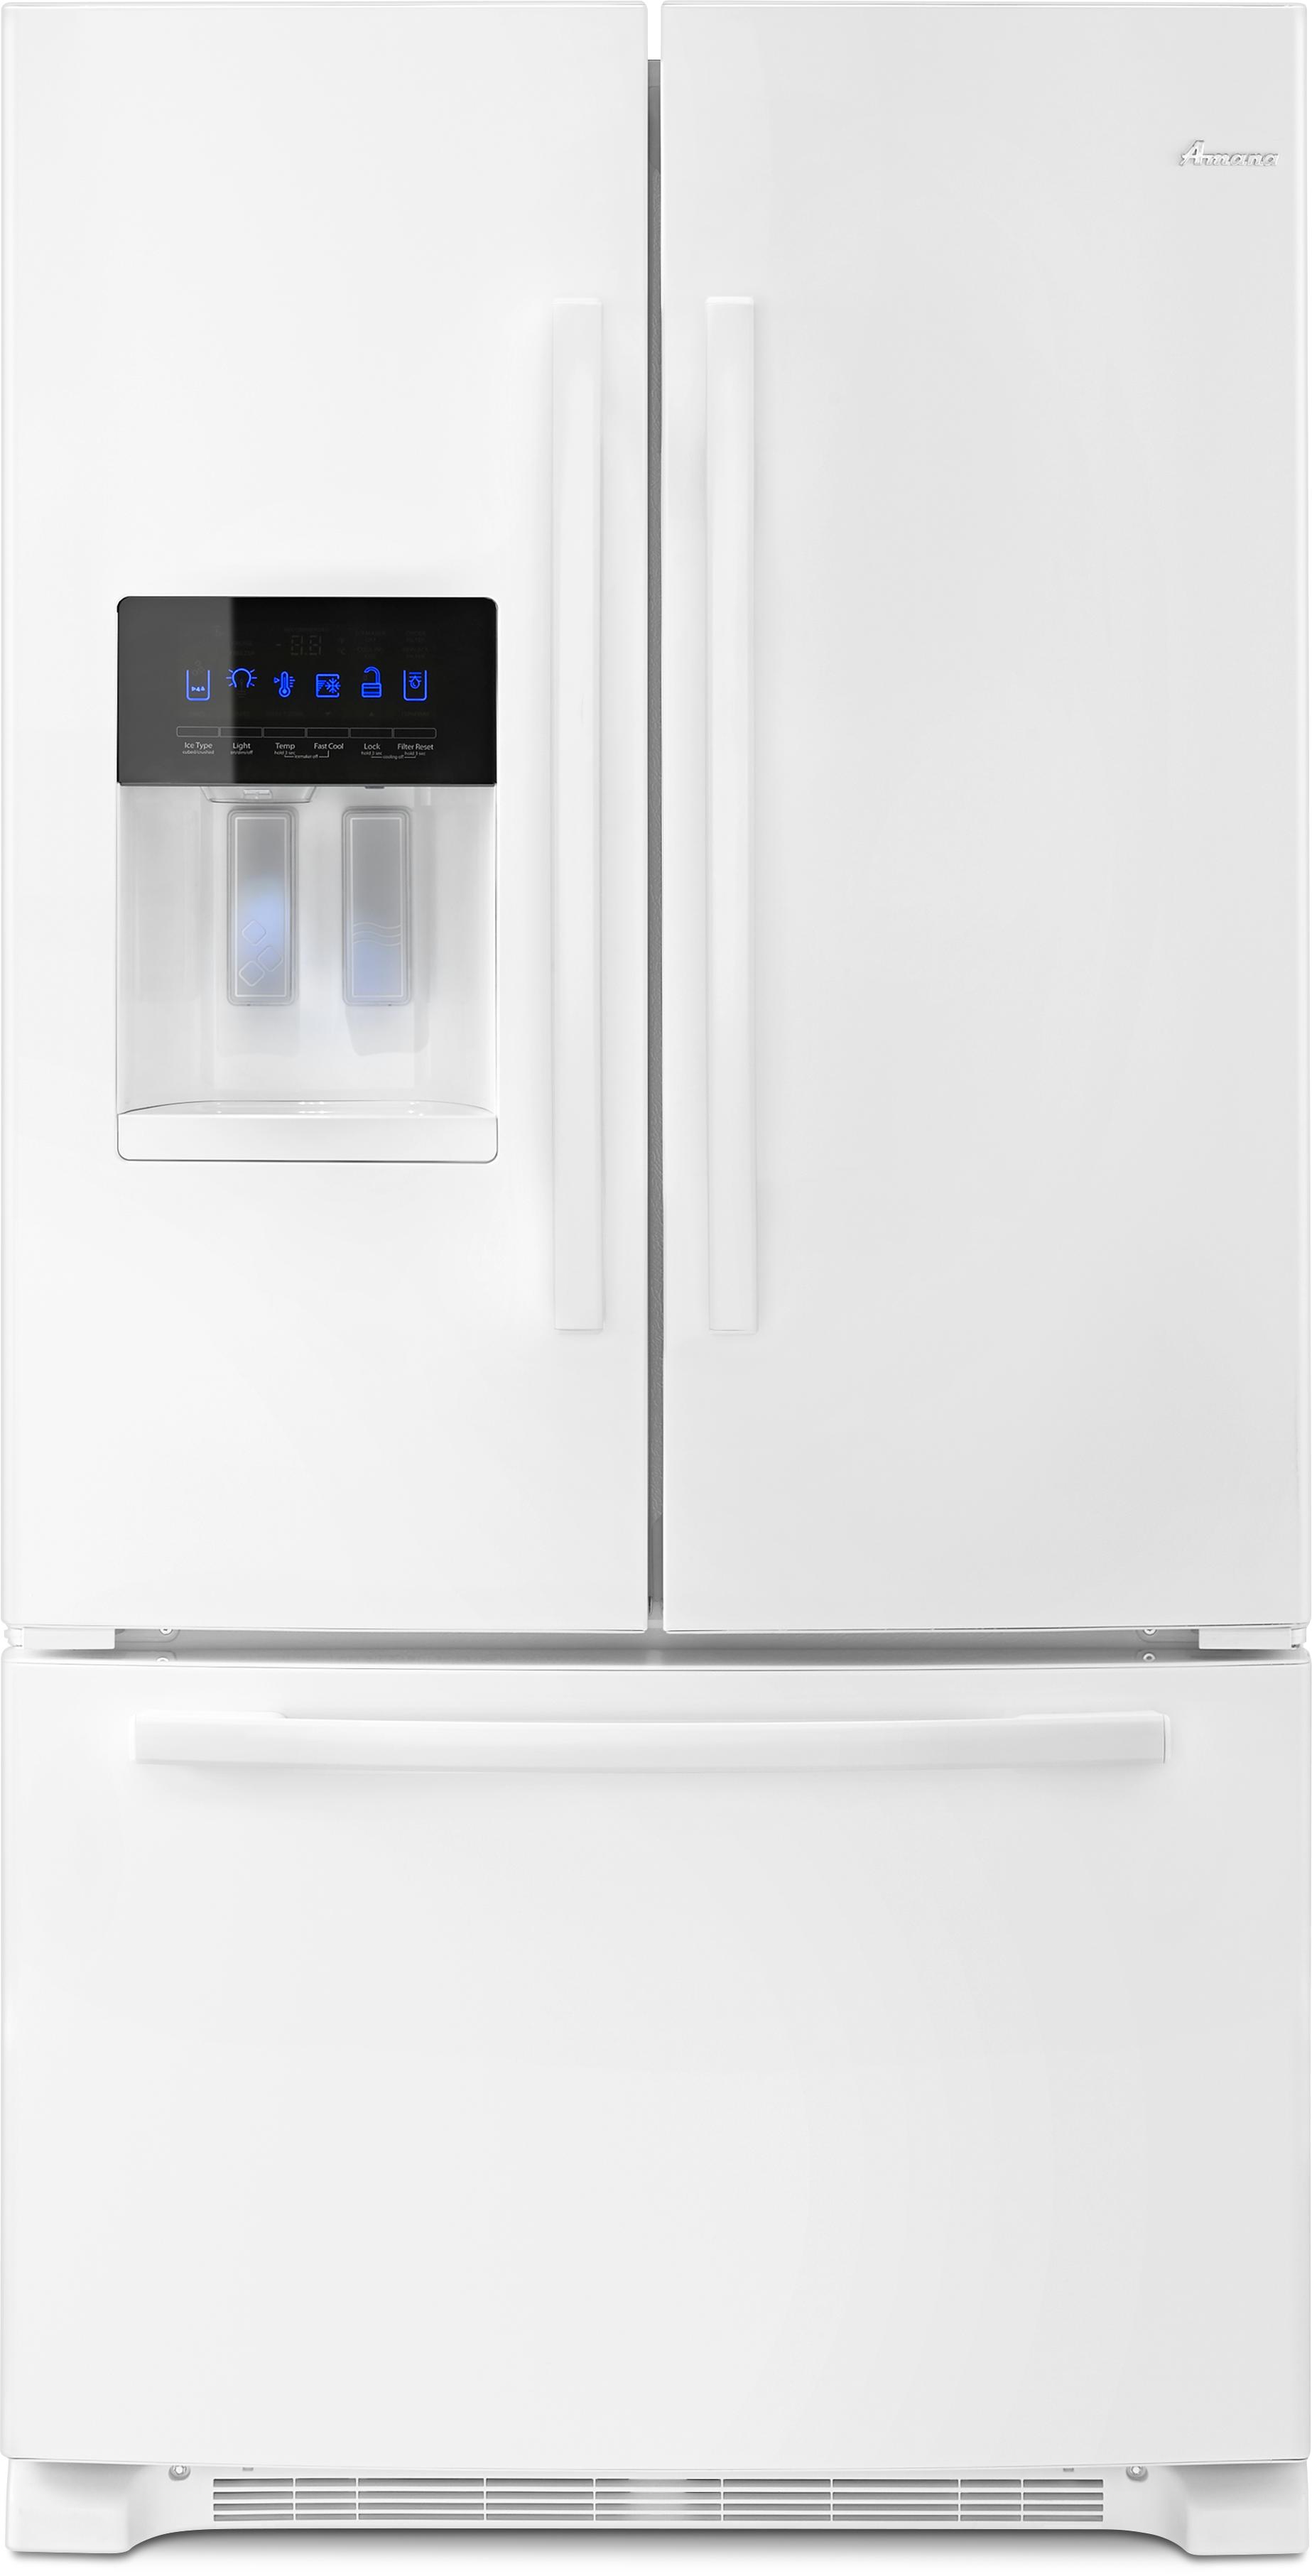 French door refrigerator ft french door bottom freezer refrigerator white afi2539erw rubansaba